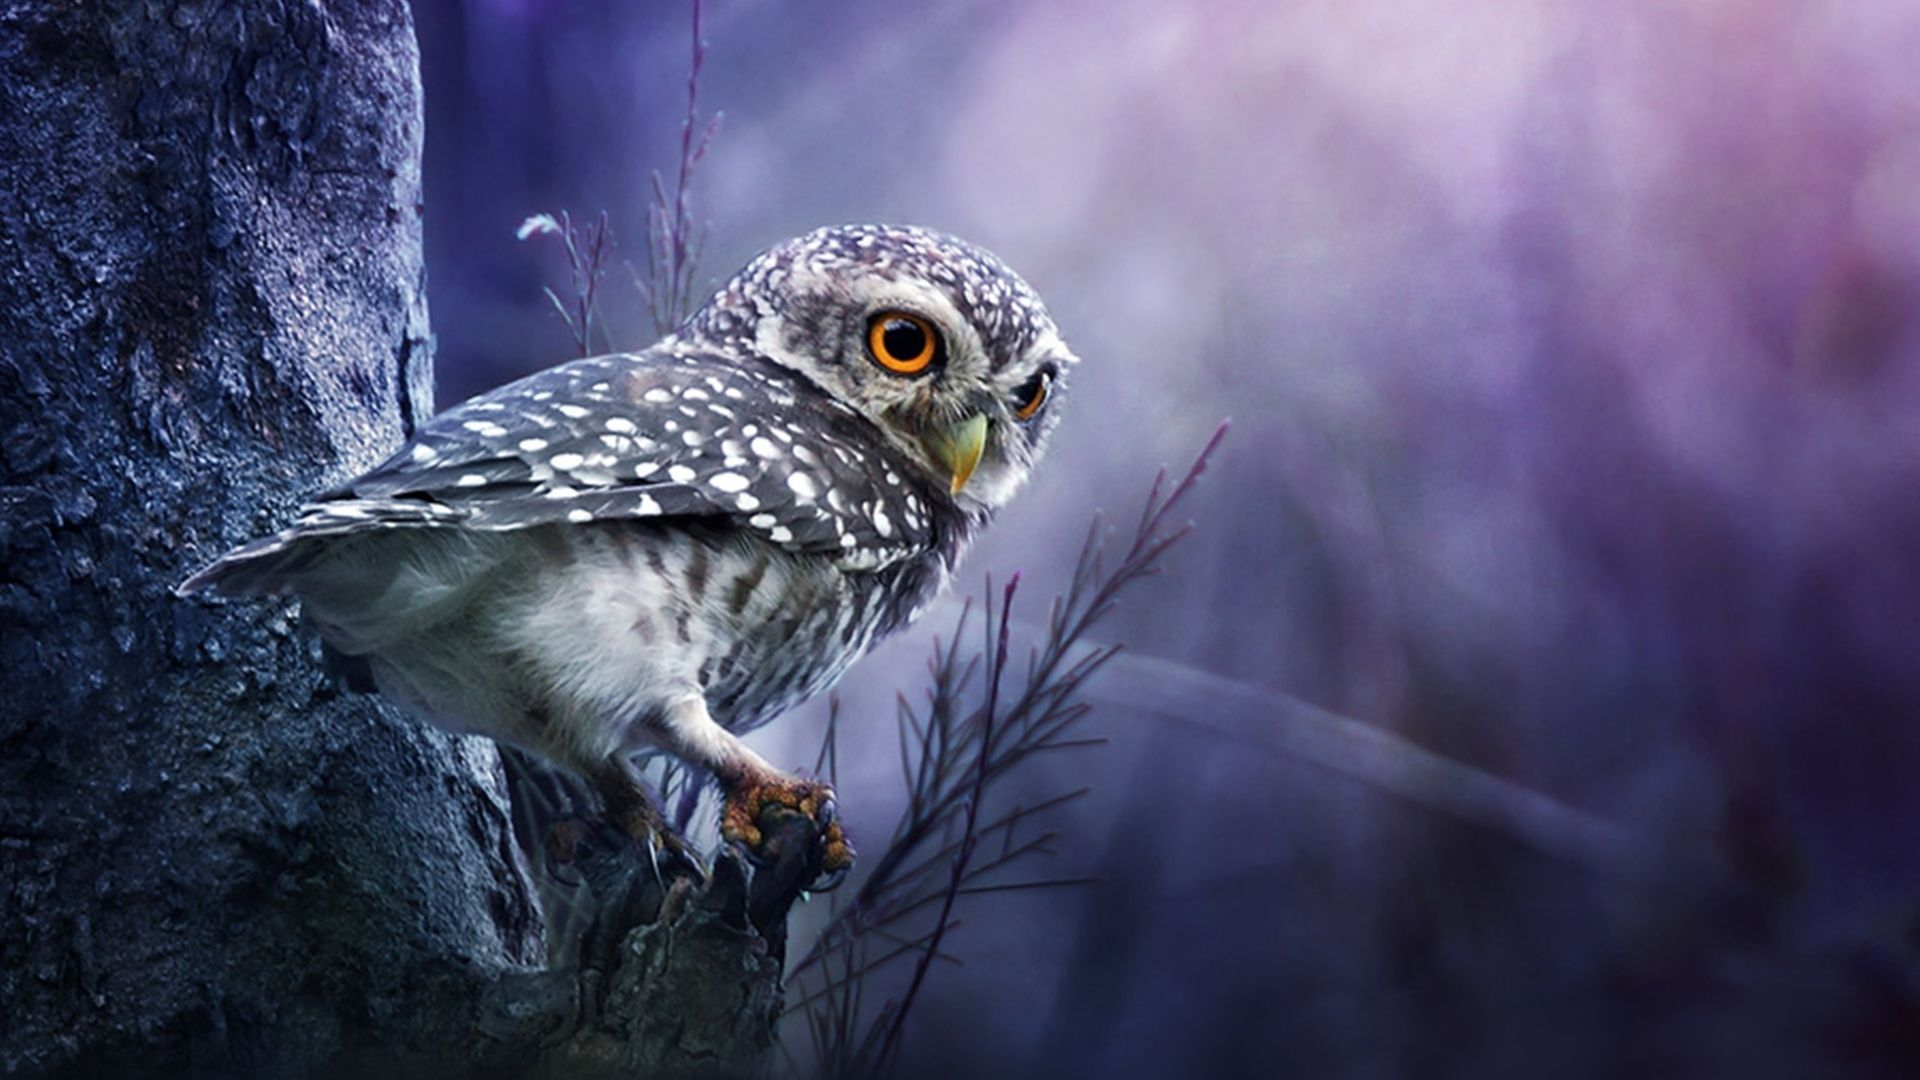 The Owl On The Desktop